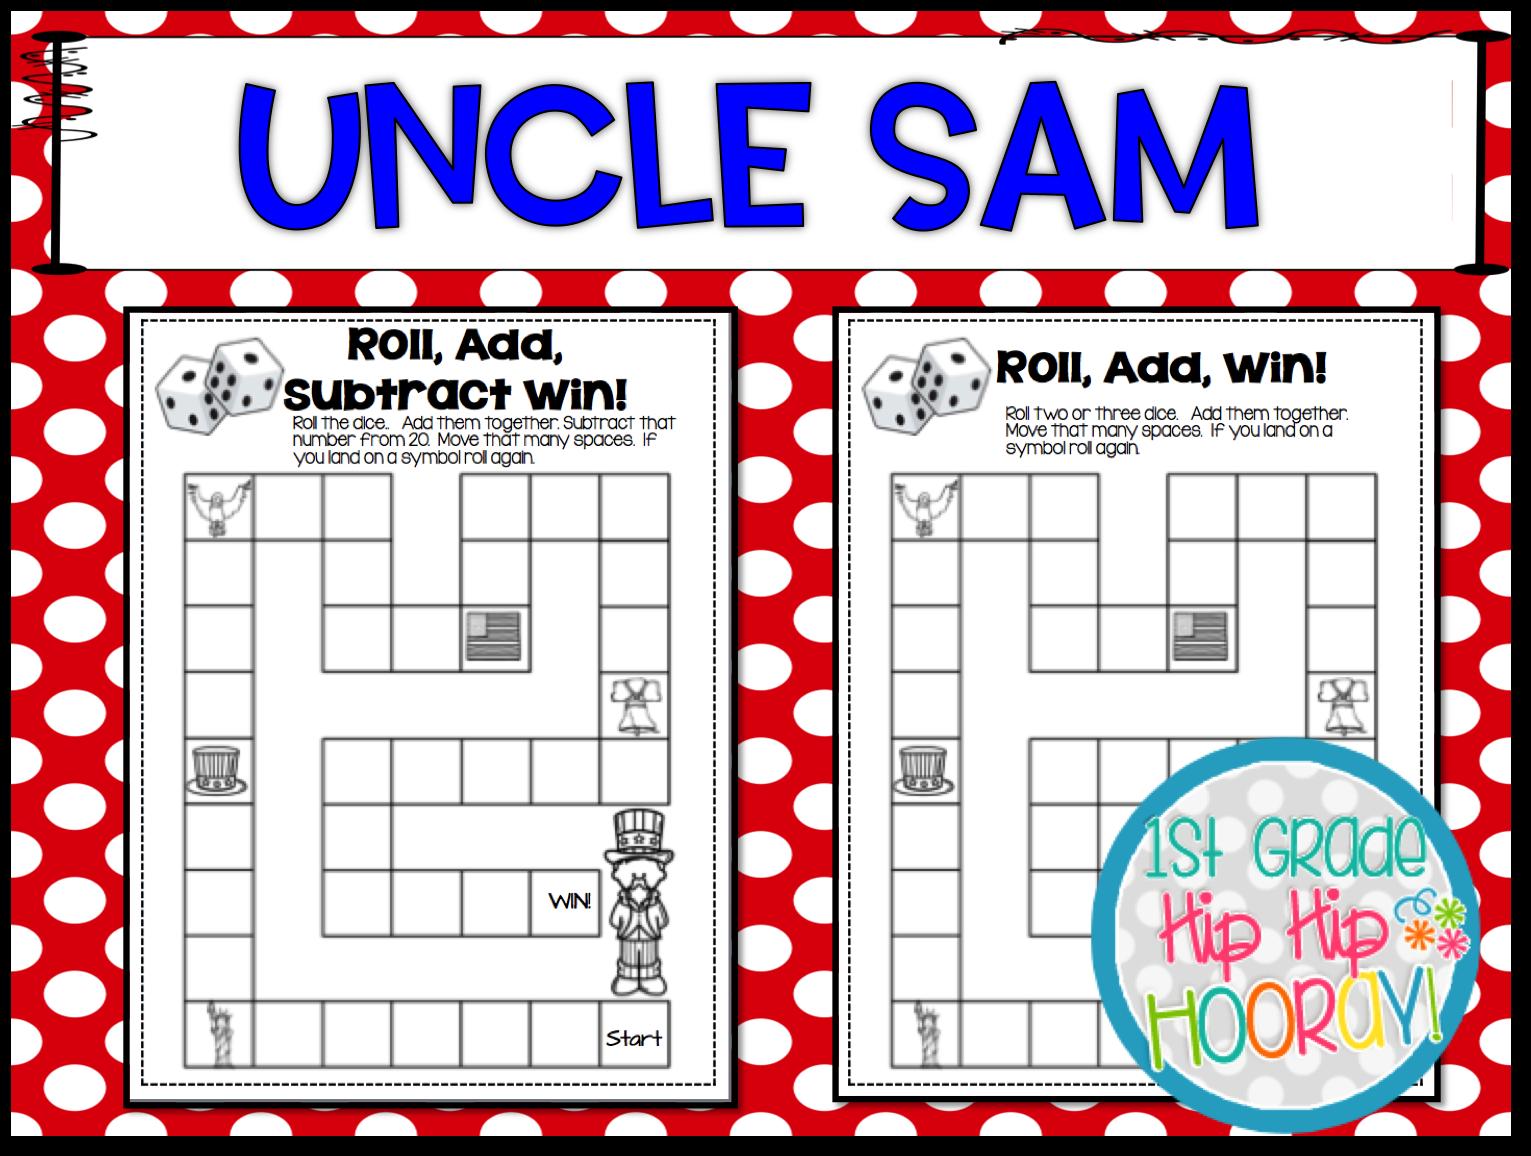 1st Grade Hip Hip Hooray Uncle Sam Day September 13th